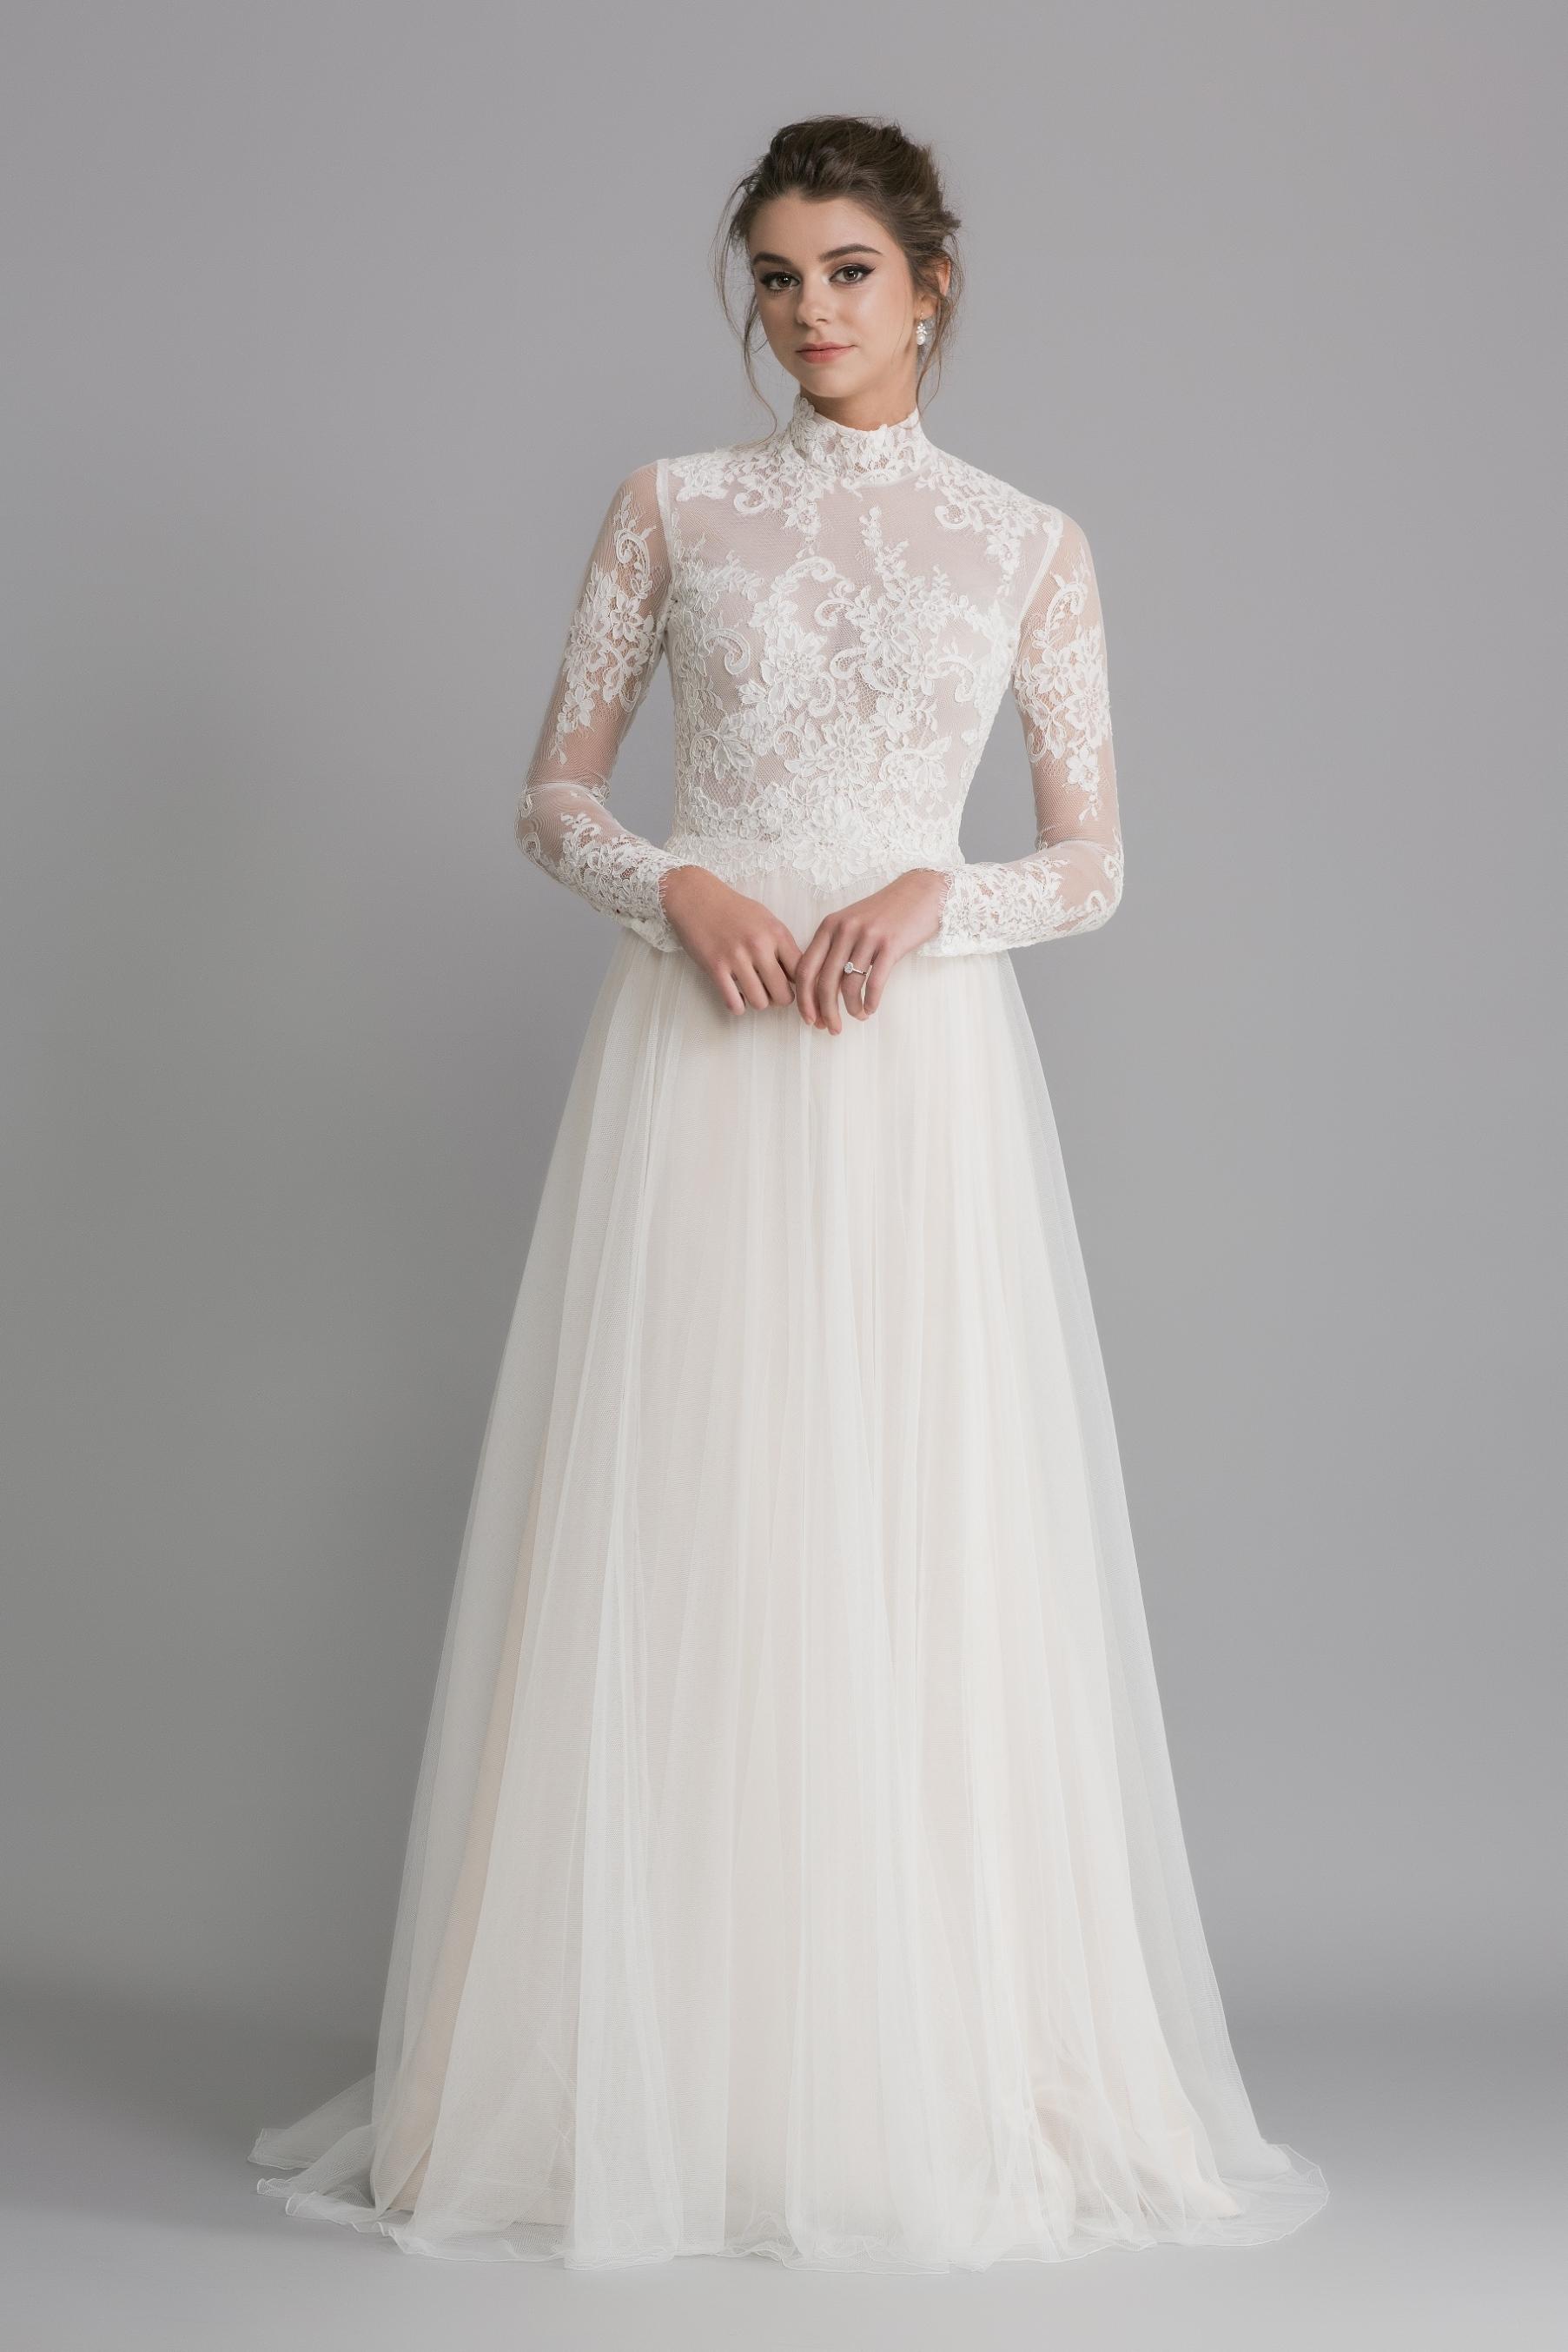 rosa wedding dress. oca626t rosa rosa wedding dress